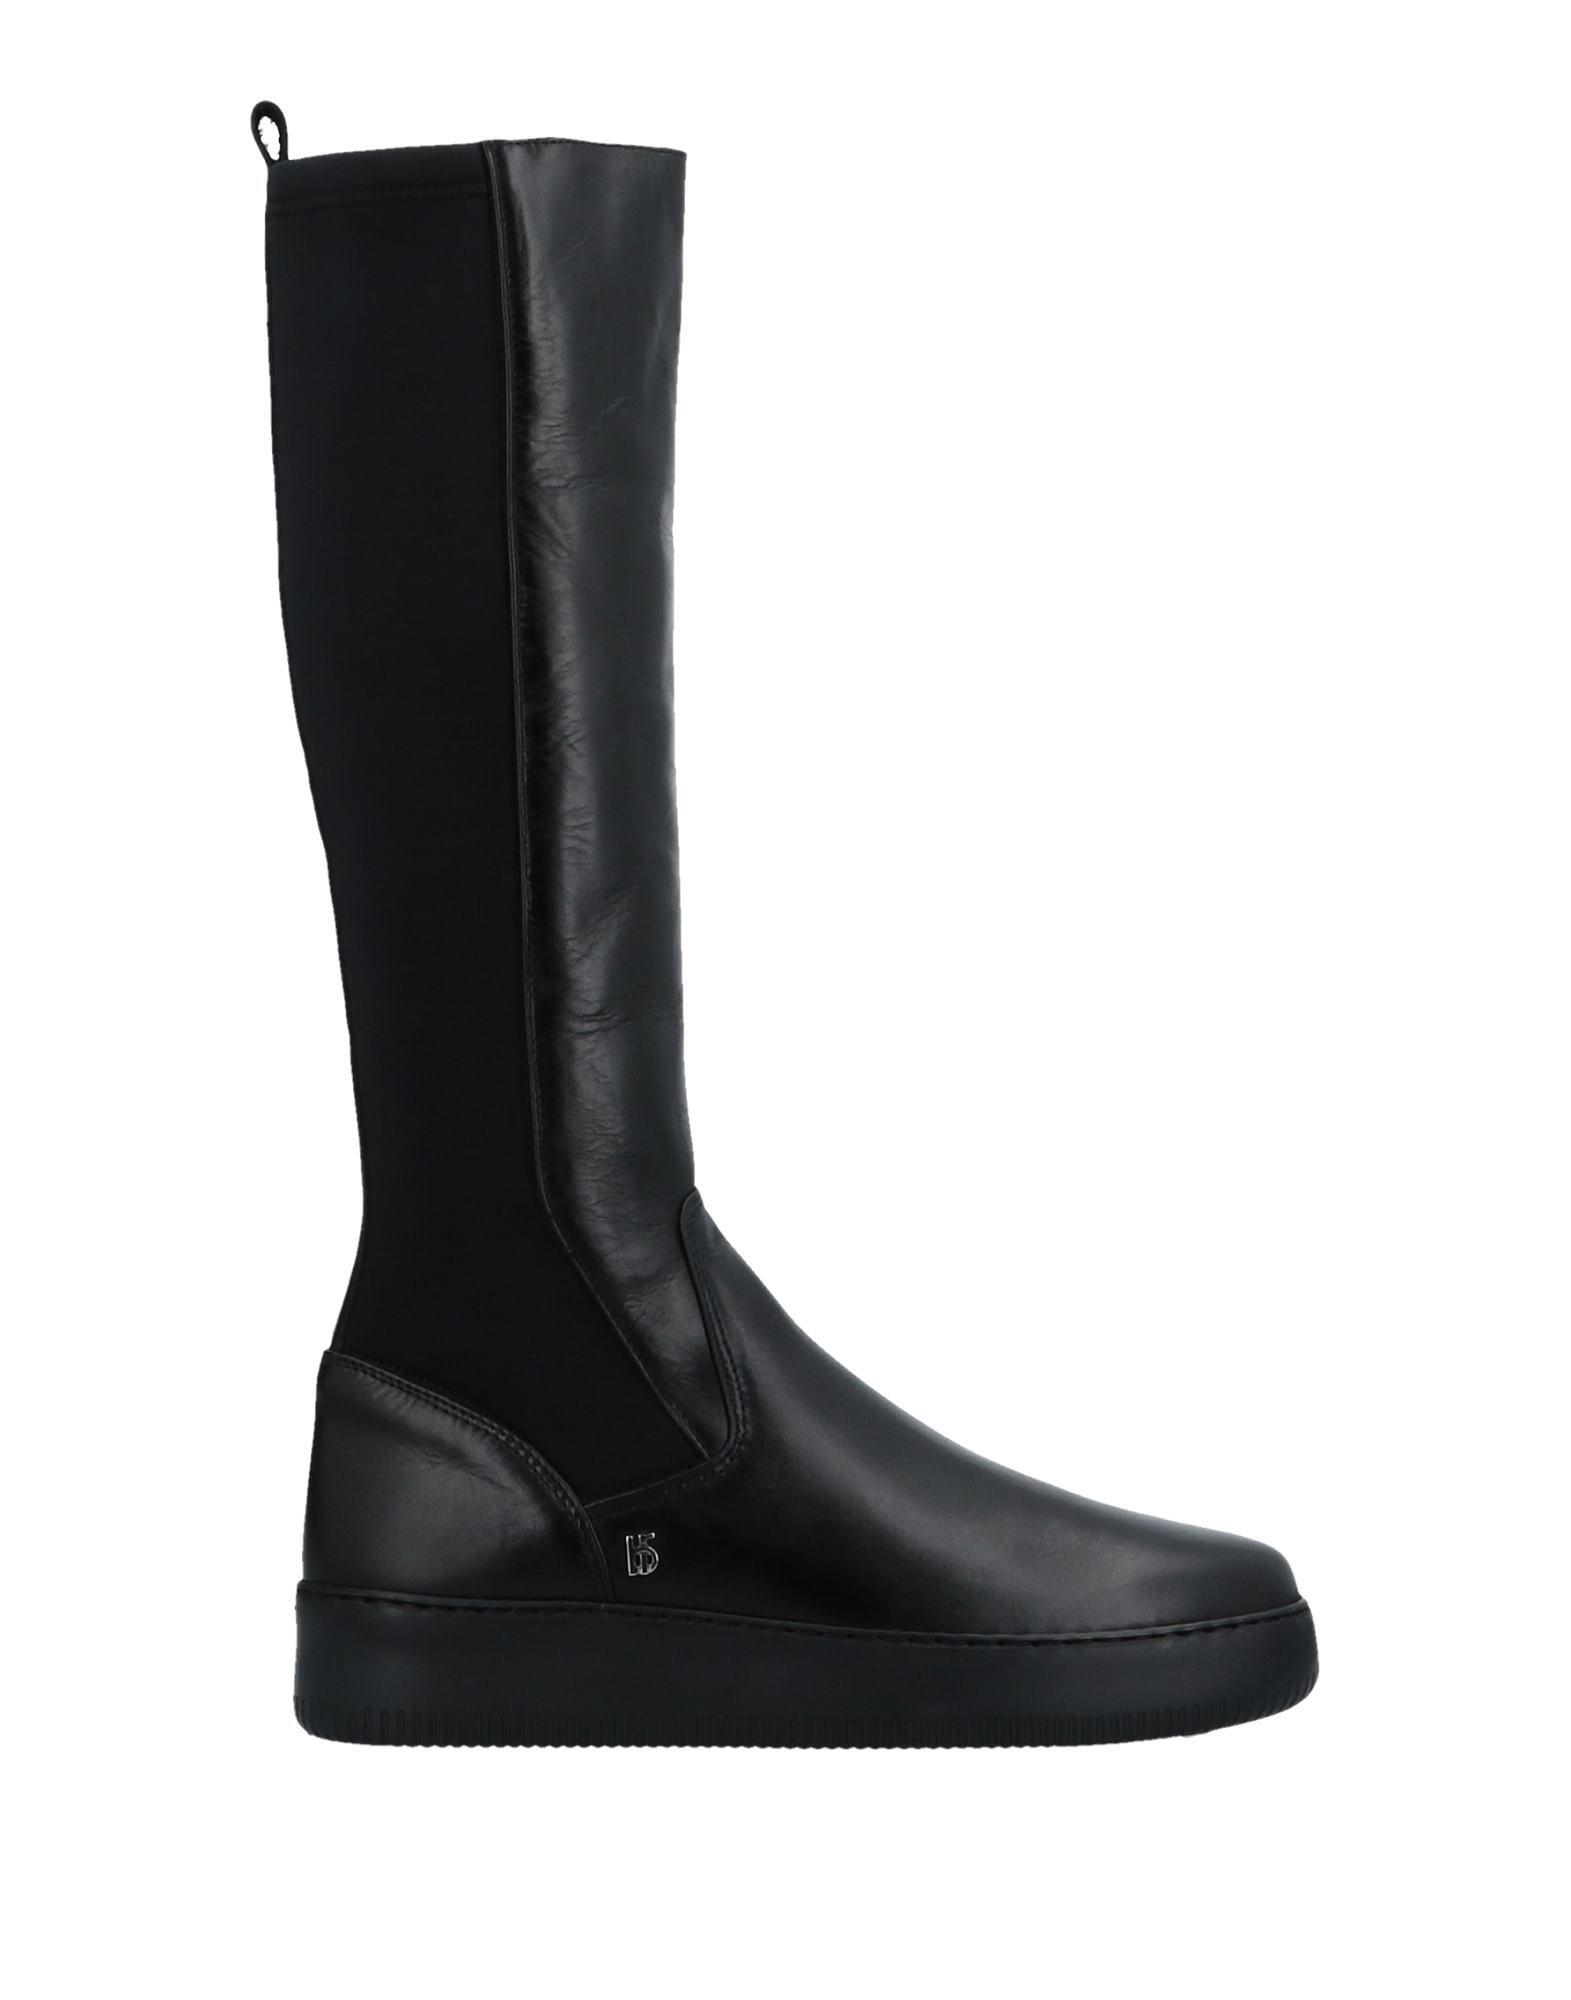 Rabatt Schuhe Stiefel Roberto Botticelli Stiefel Schuhe Damen  11512819AR 5696e6